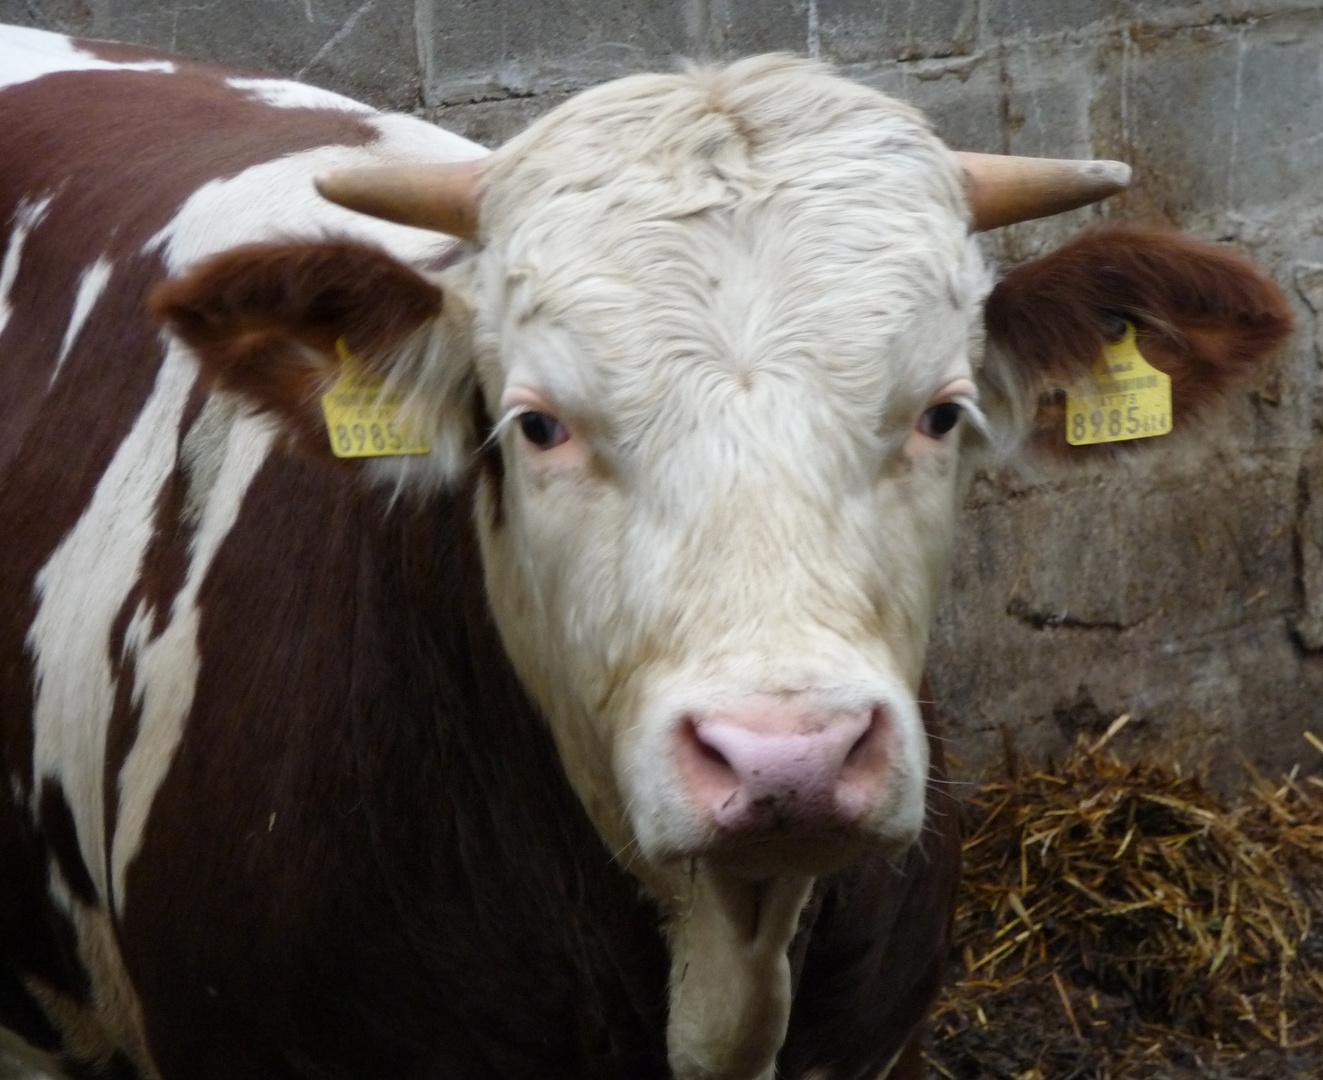 Ferdinand The Bull?